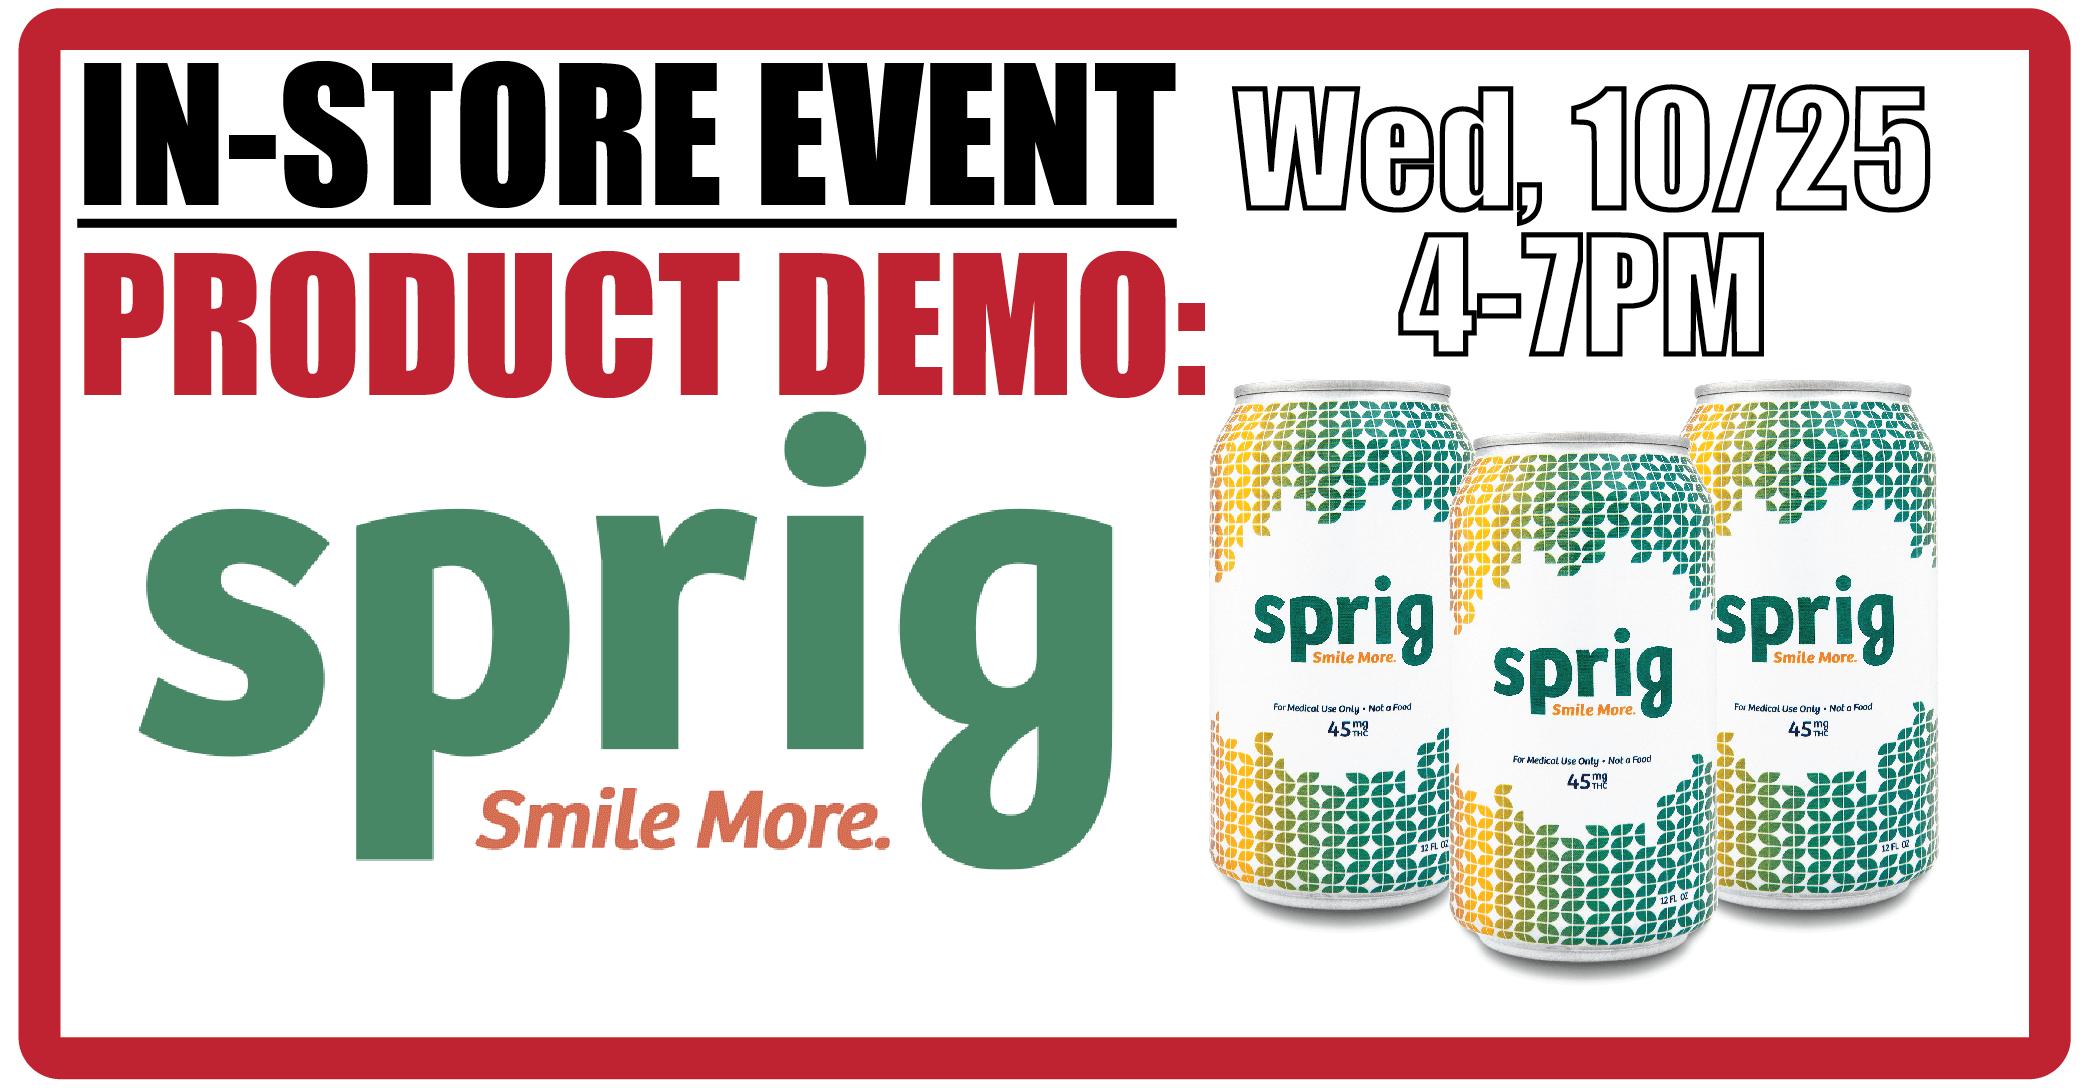 Product Demonstrations Summer 2017_sprig_1025-01 (1).png